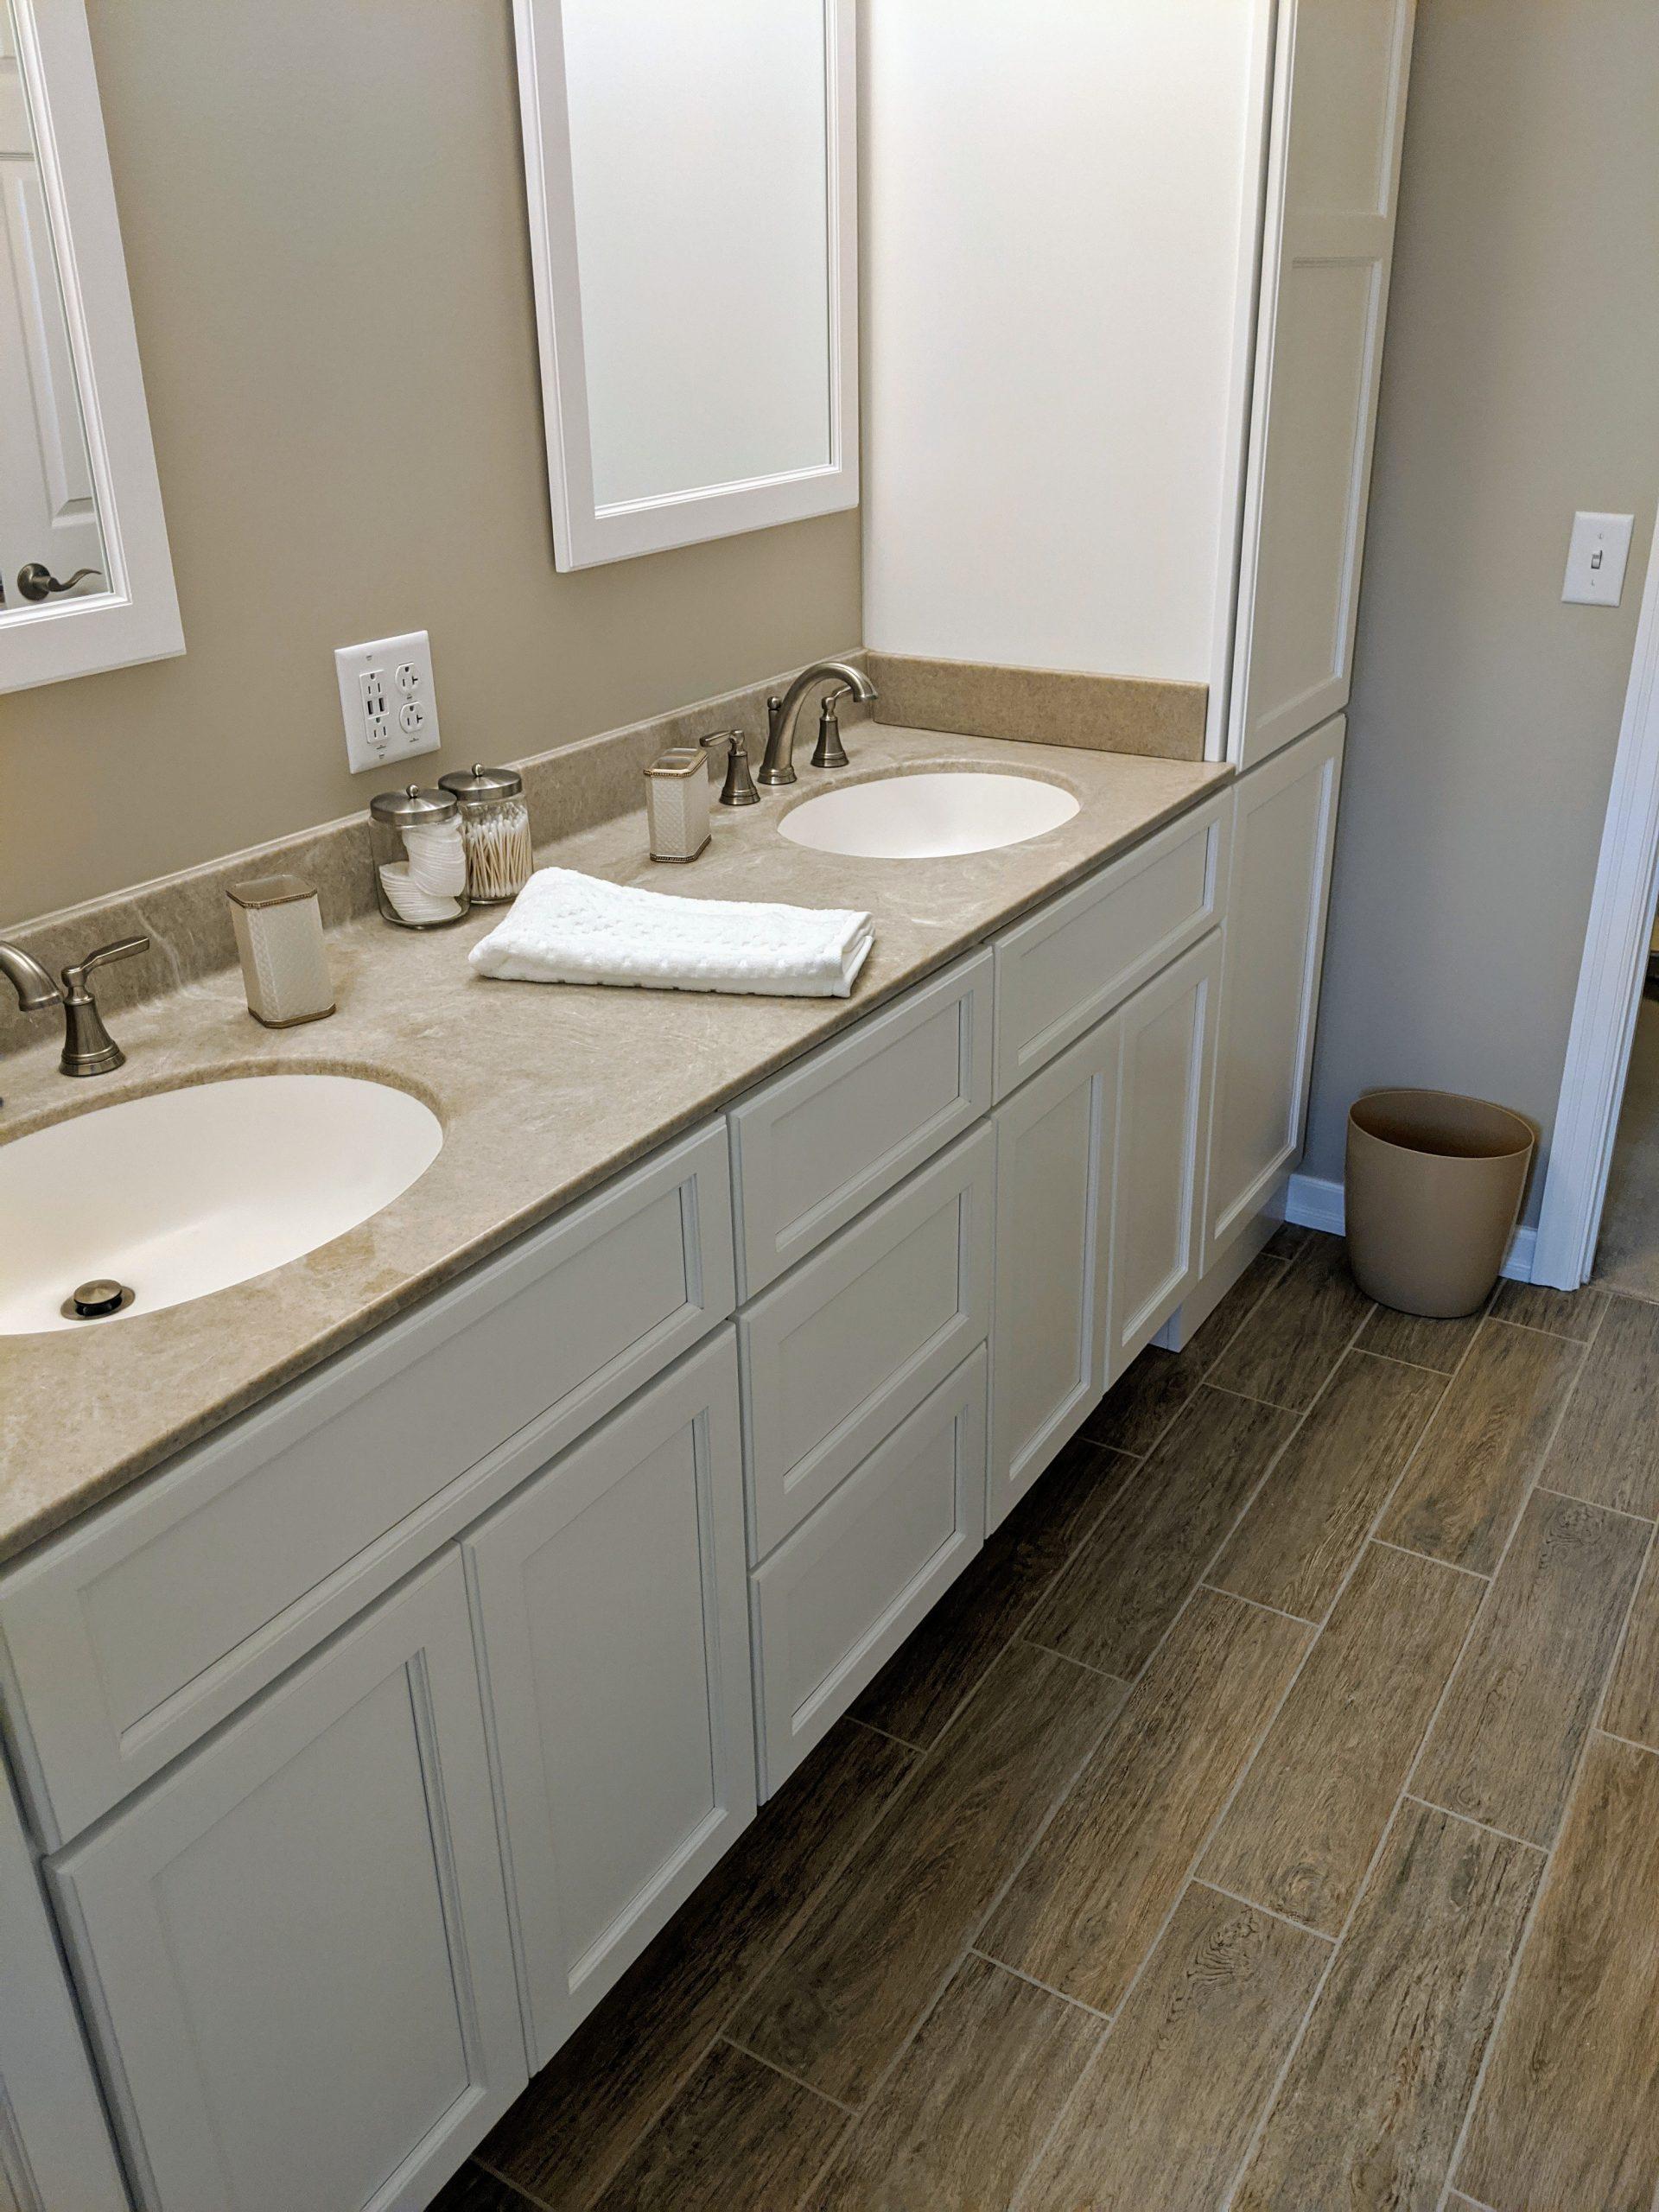 McLaughlin bathroom 4